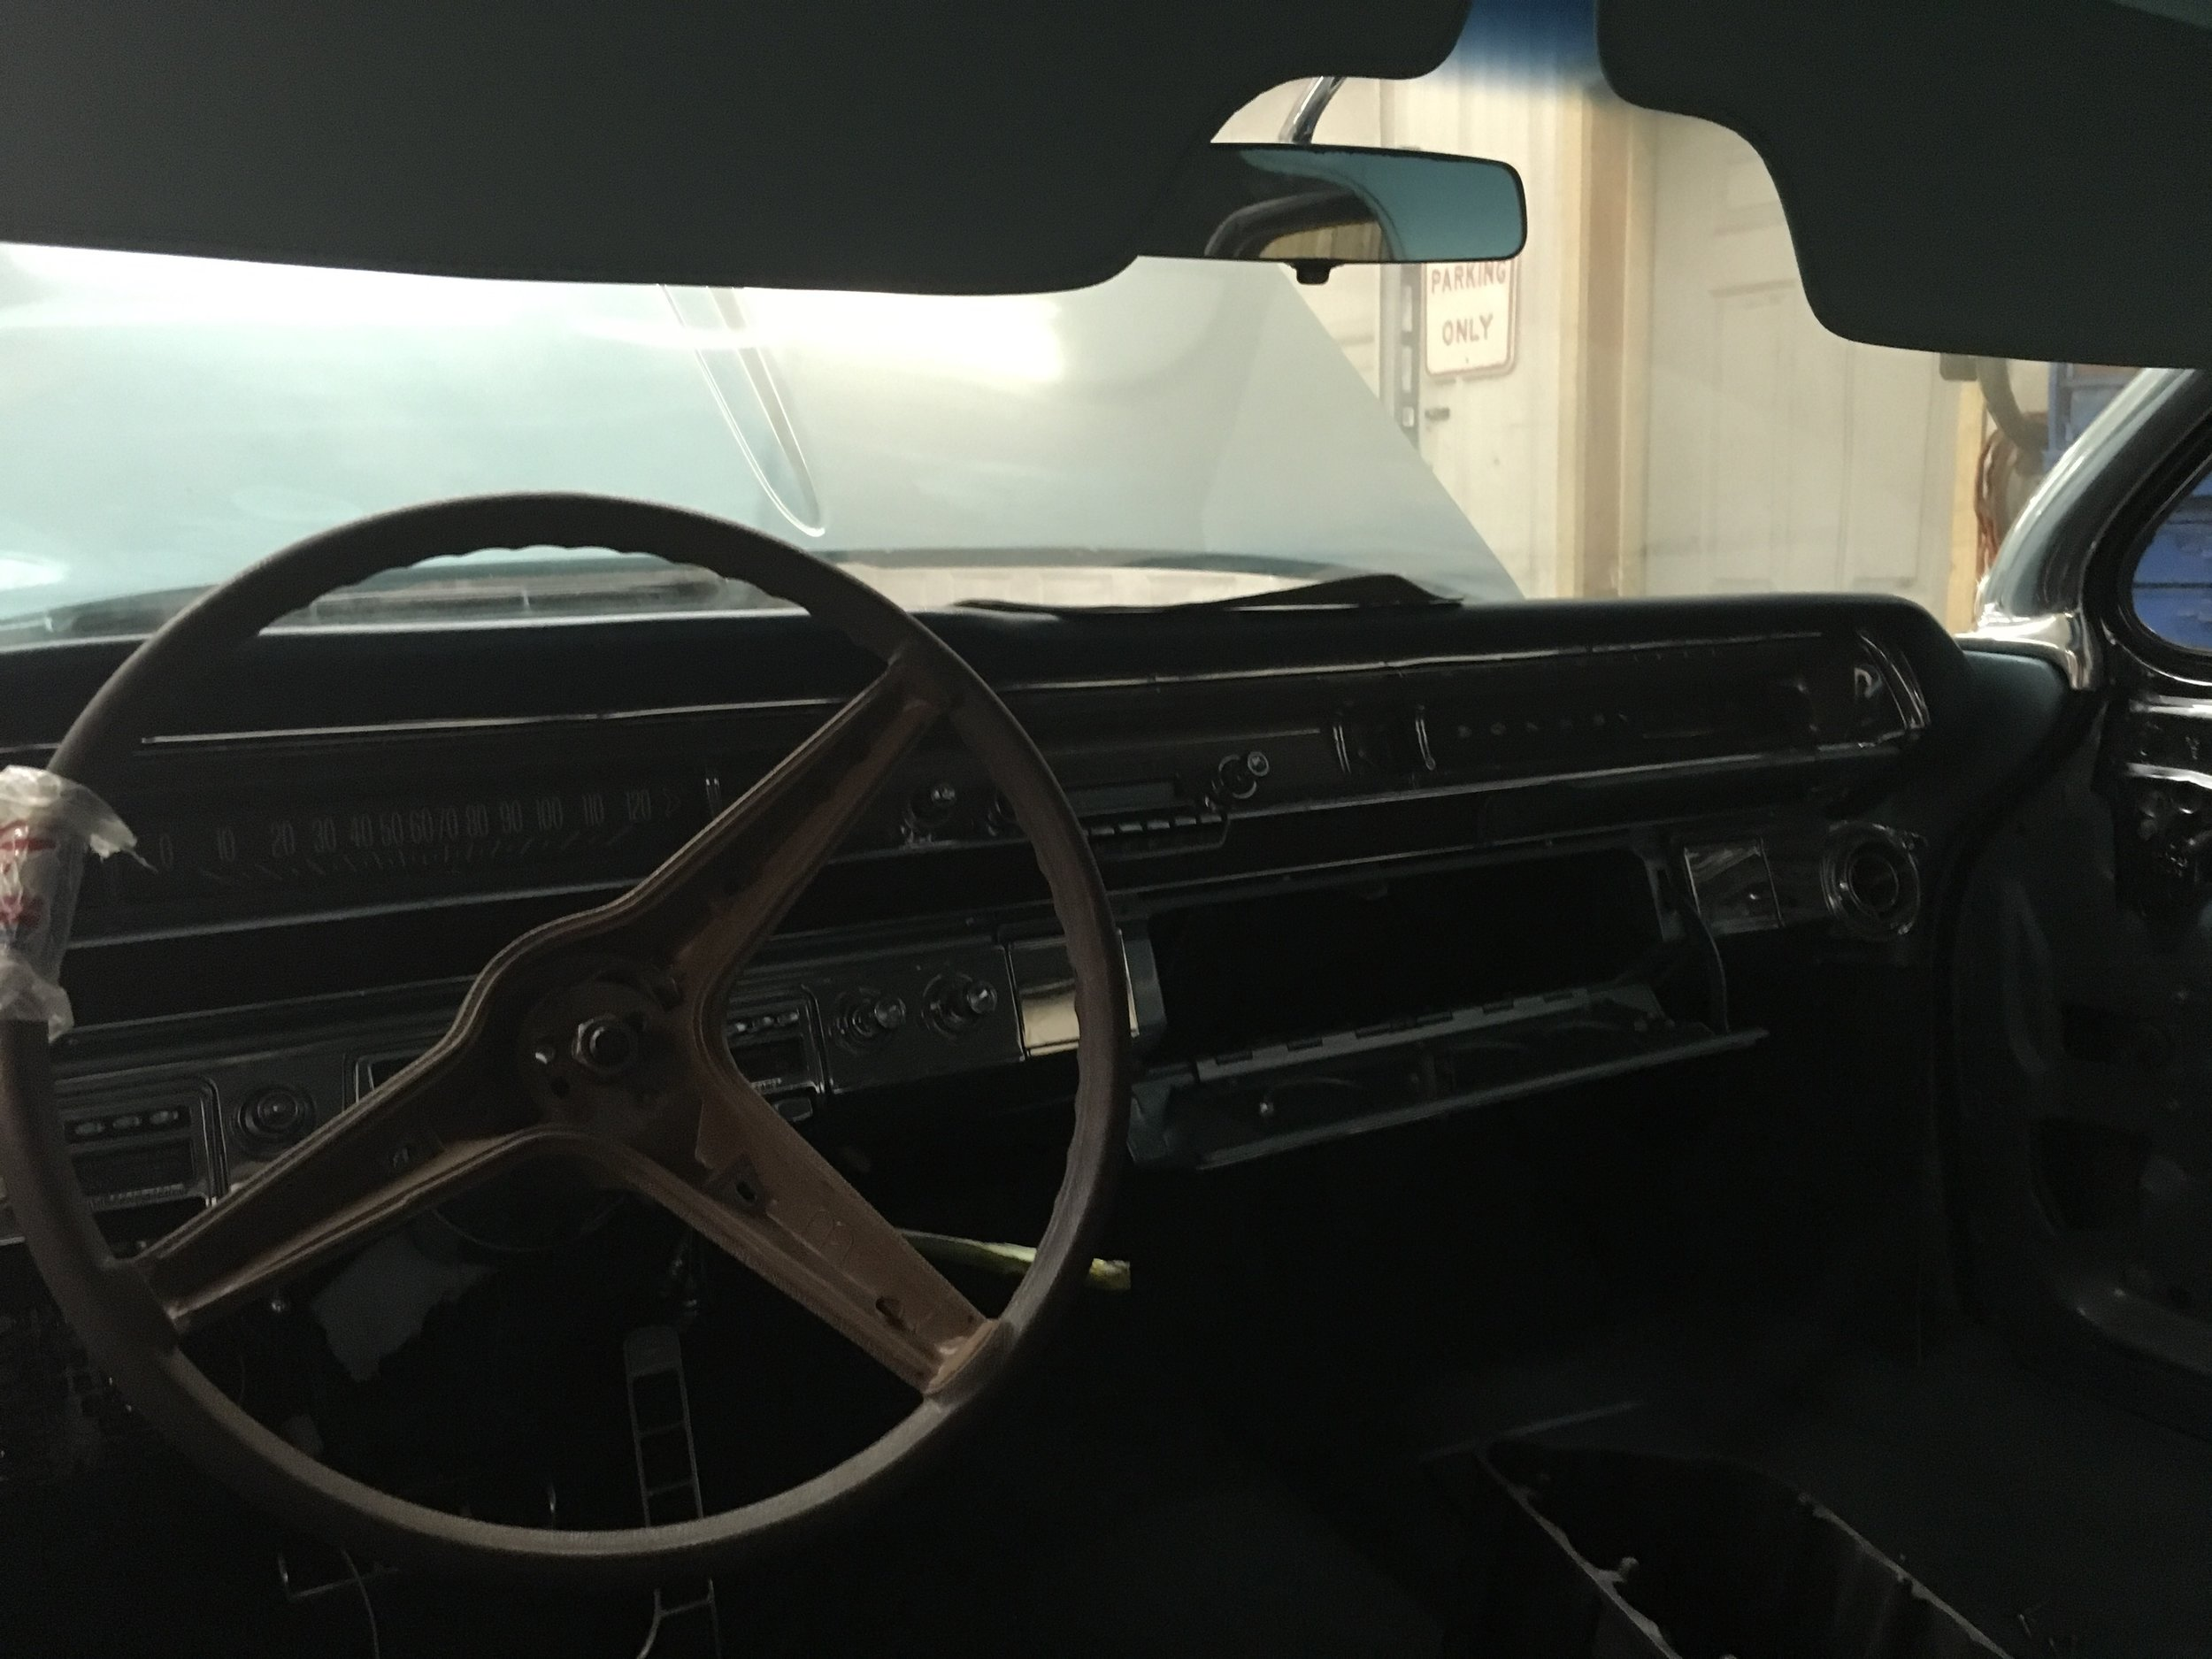 1962-Pontiac-Bonneville-minneapolis-hot-rod-custom-build-restoration-steering-wheel.jpg